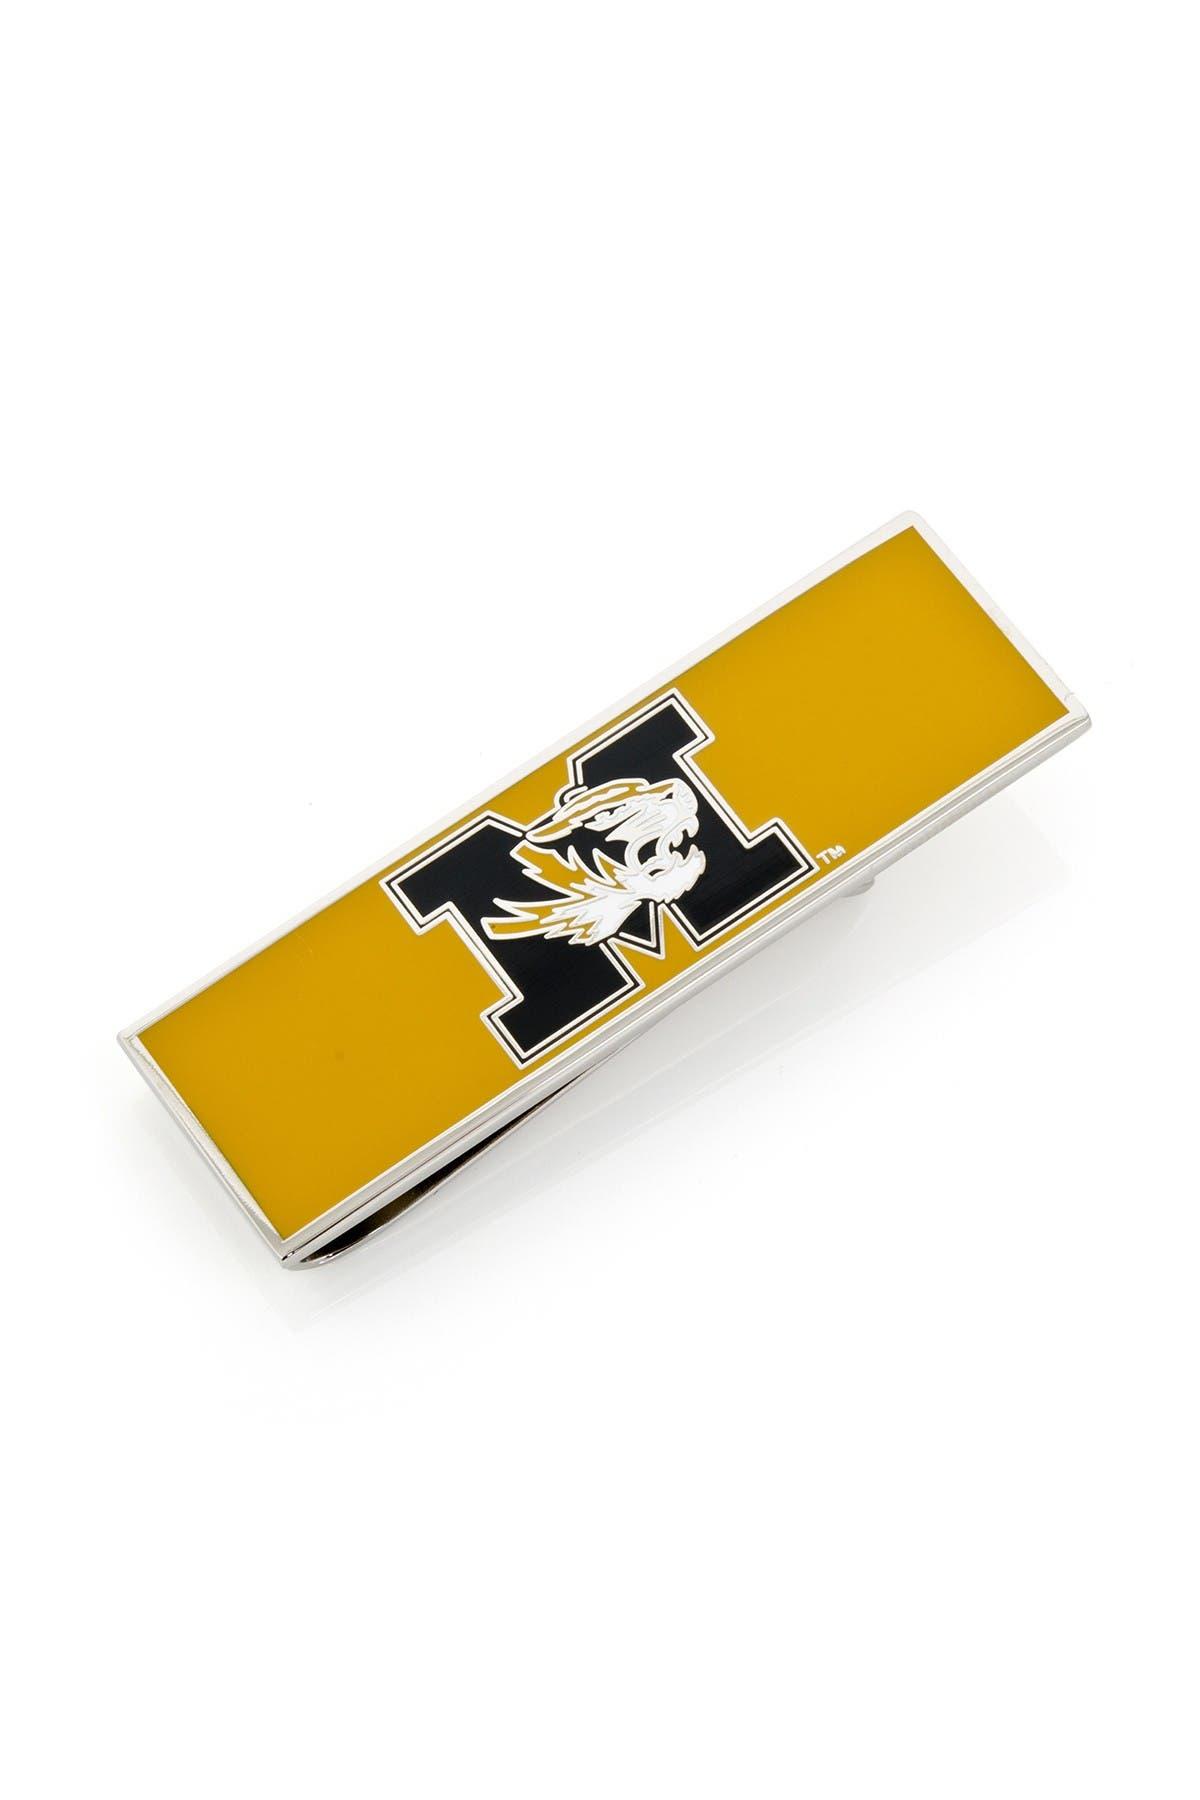 Image of Cufflinks Inc. University of Missouri Tigers Money Clip